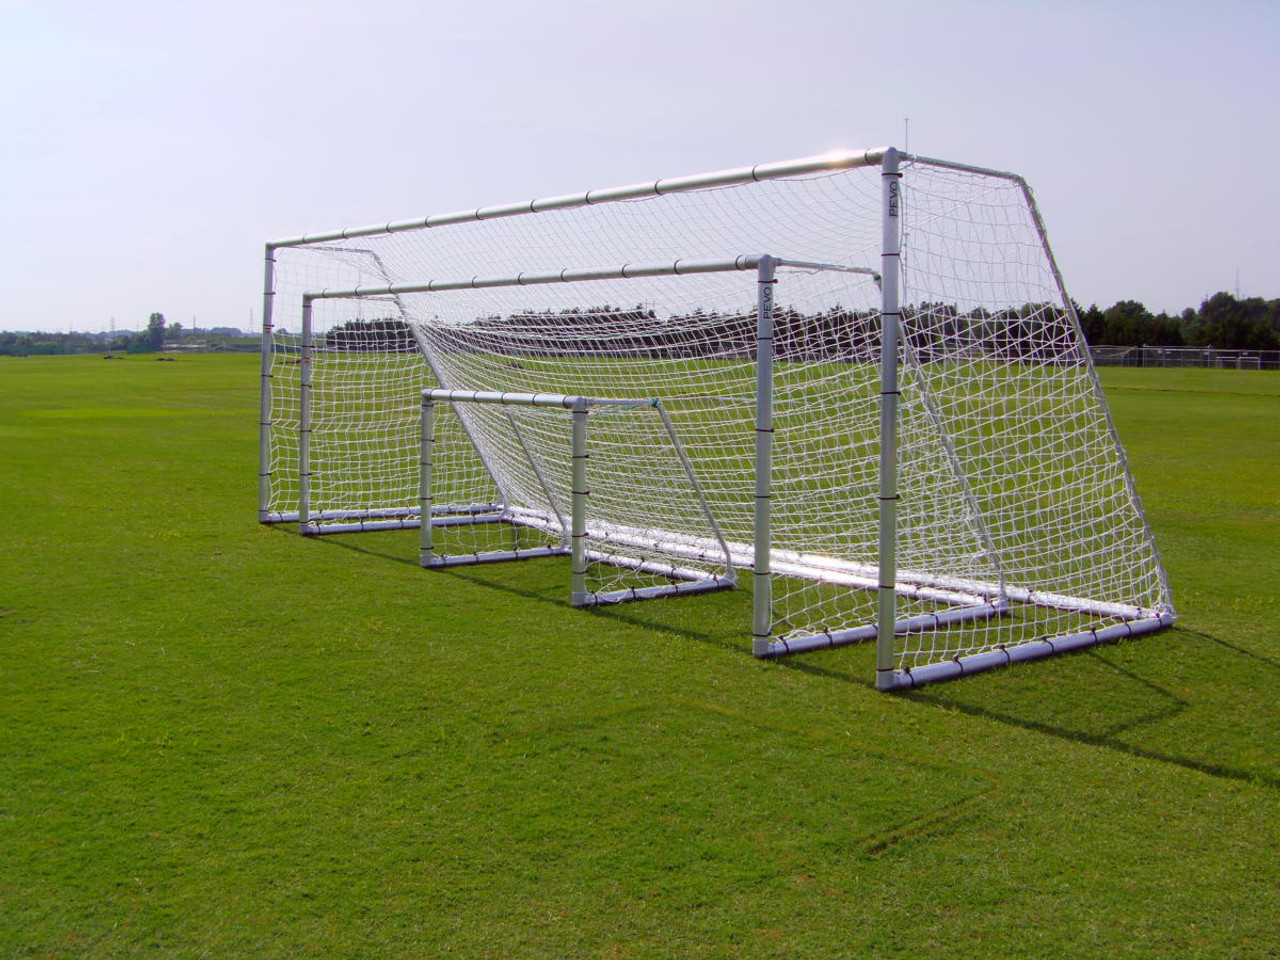 Pevo Soccer Goals 6.5 x 18'_4